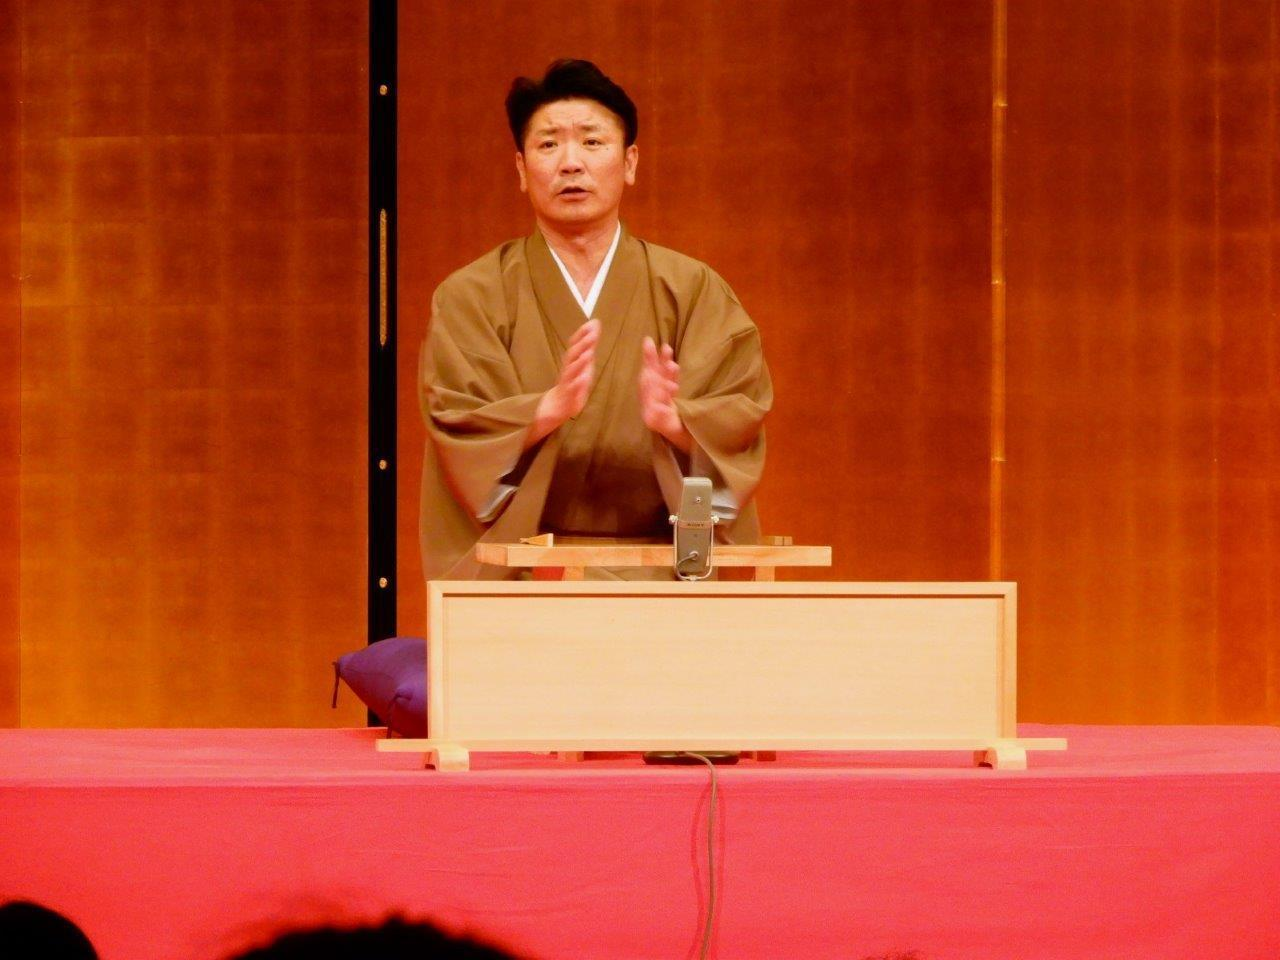 http://news.yoshimoto.co.jp/20180607210434-d746f9ef728436dc3f8bc5ae6d63ae44ceb4c107.jpg